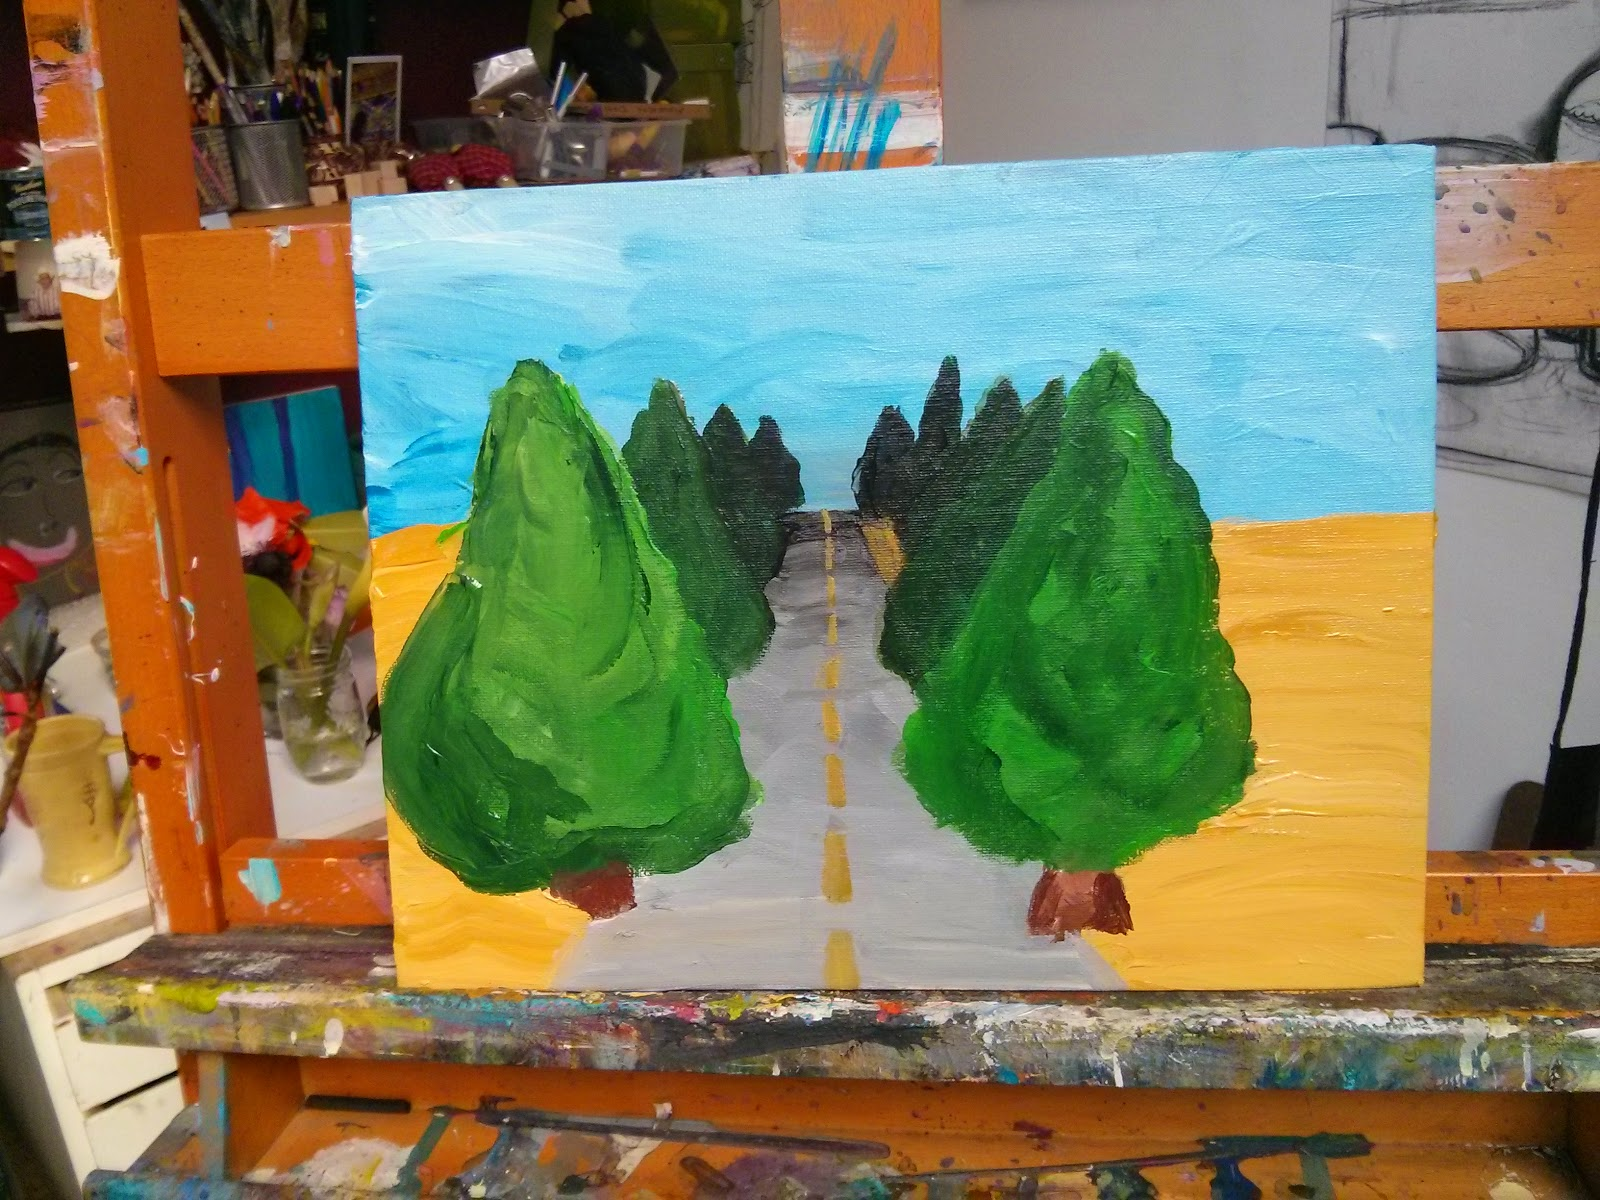 Studio Kids Children S Art Classes In Ballard Seattle Painting